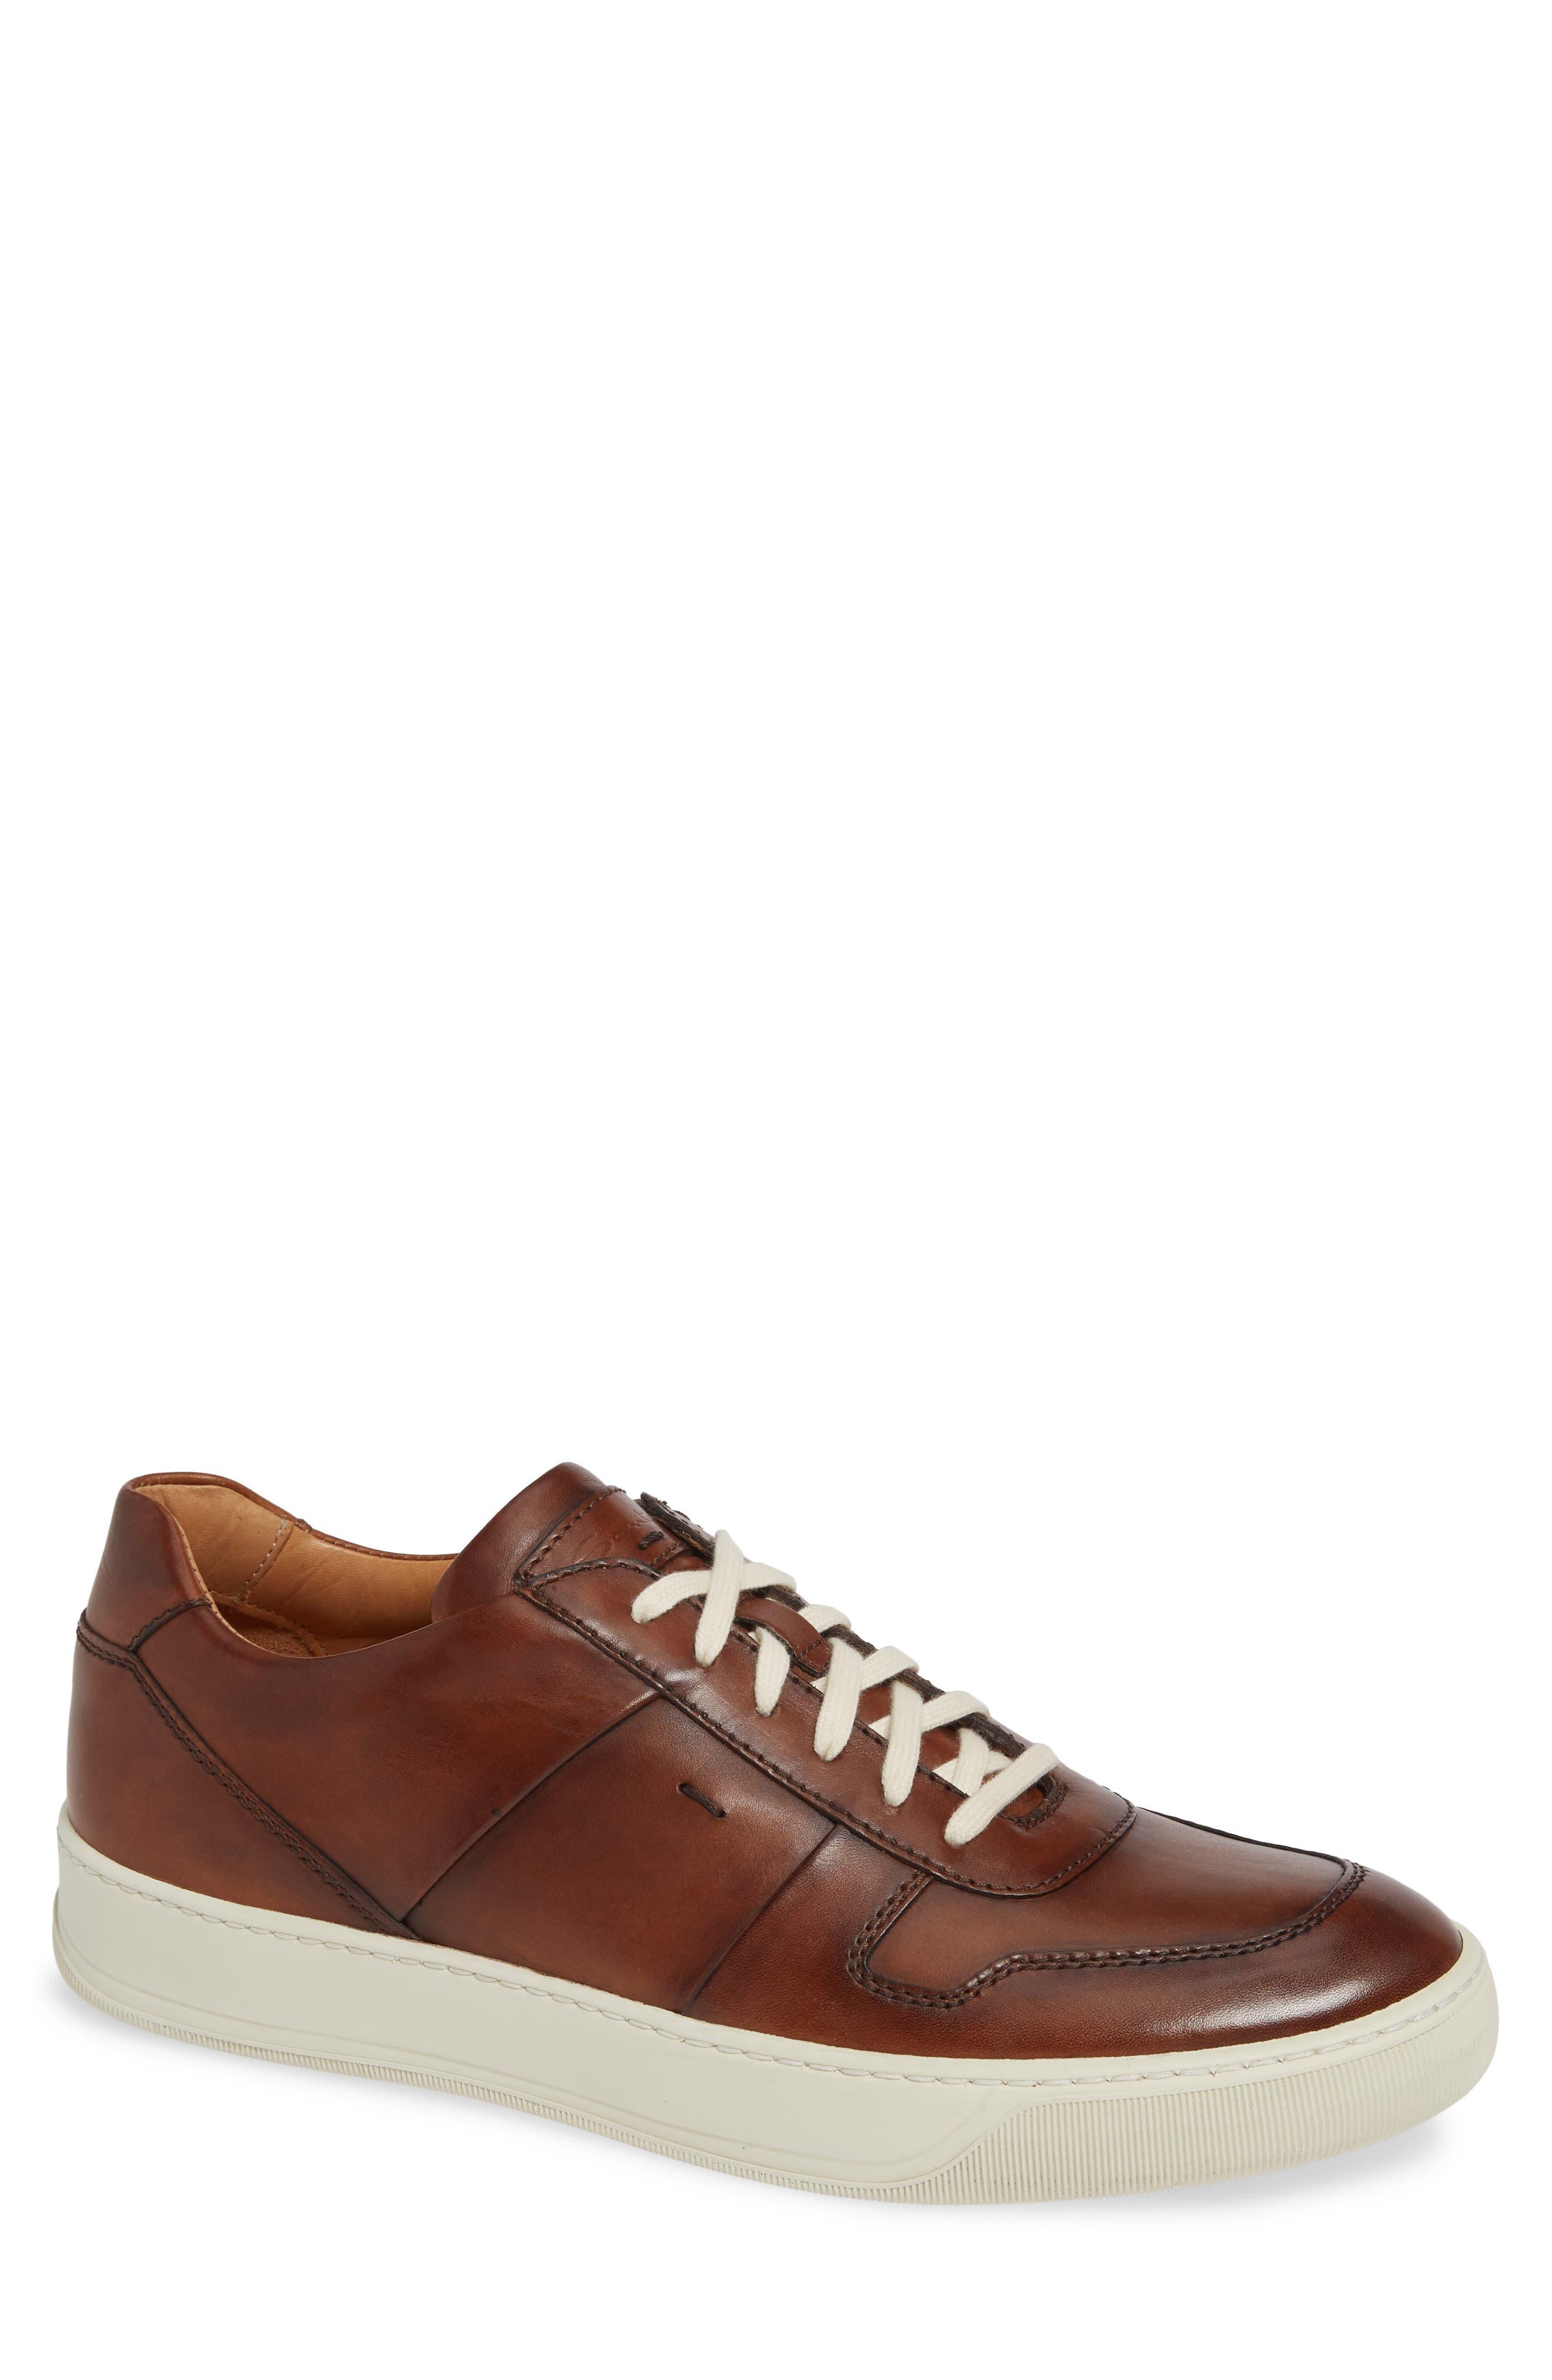 Birch Sneaker,                         Main,                         color, BROWN